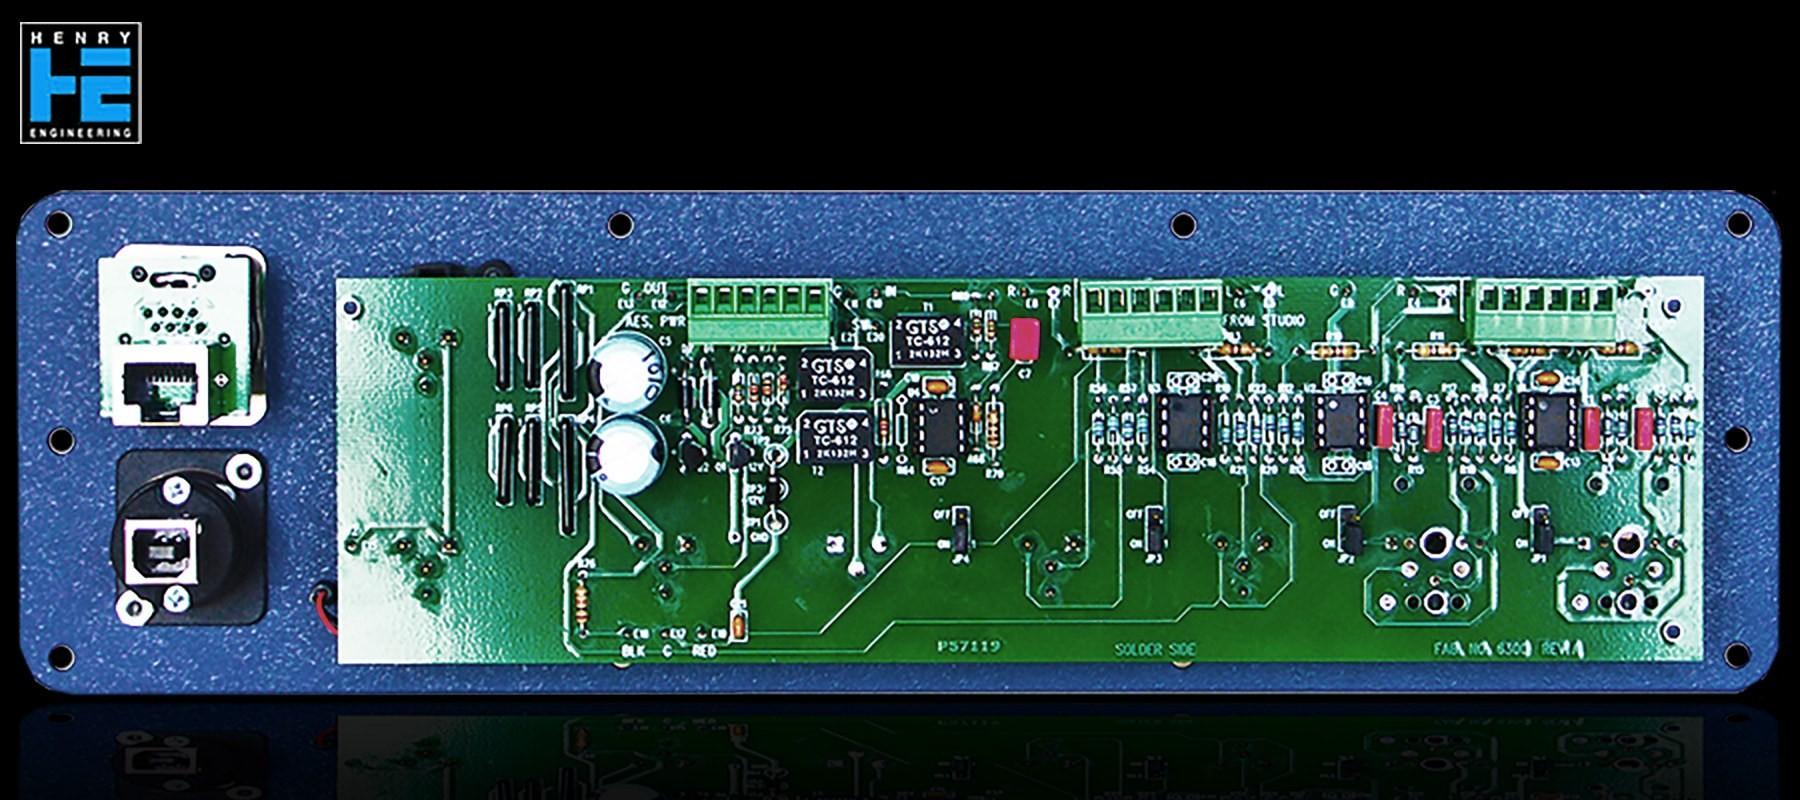 Henry Engineering MultiPort - Back